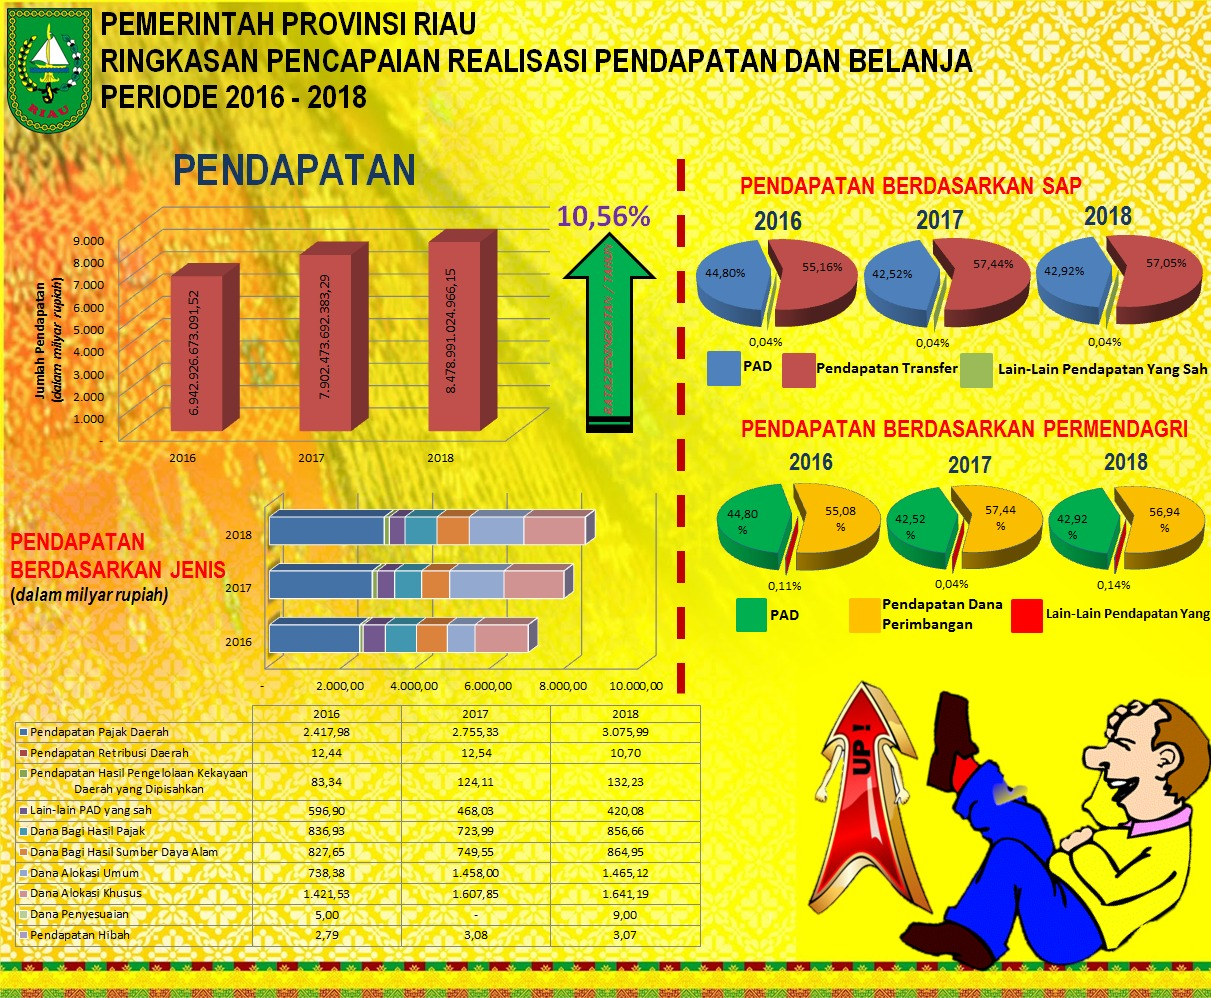 Ringkasan Pencapaian Realisasi Pendapatan